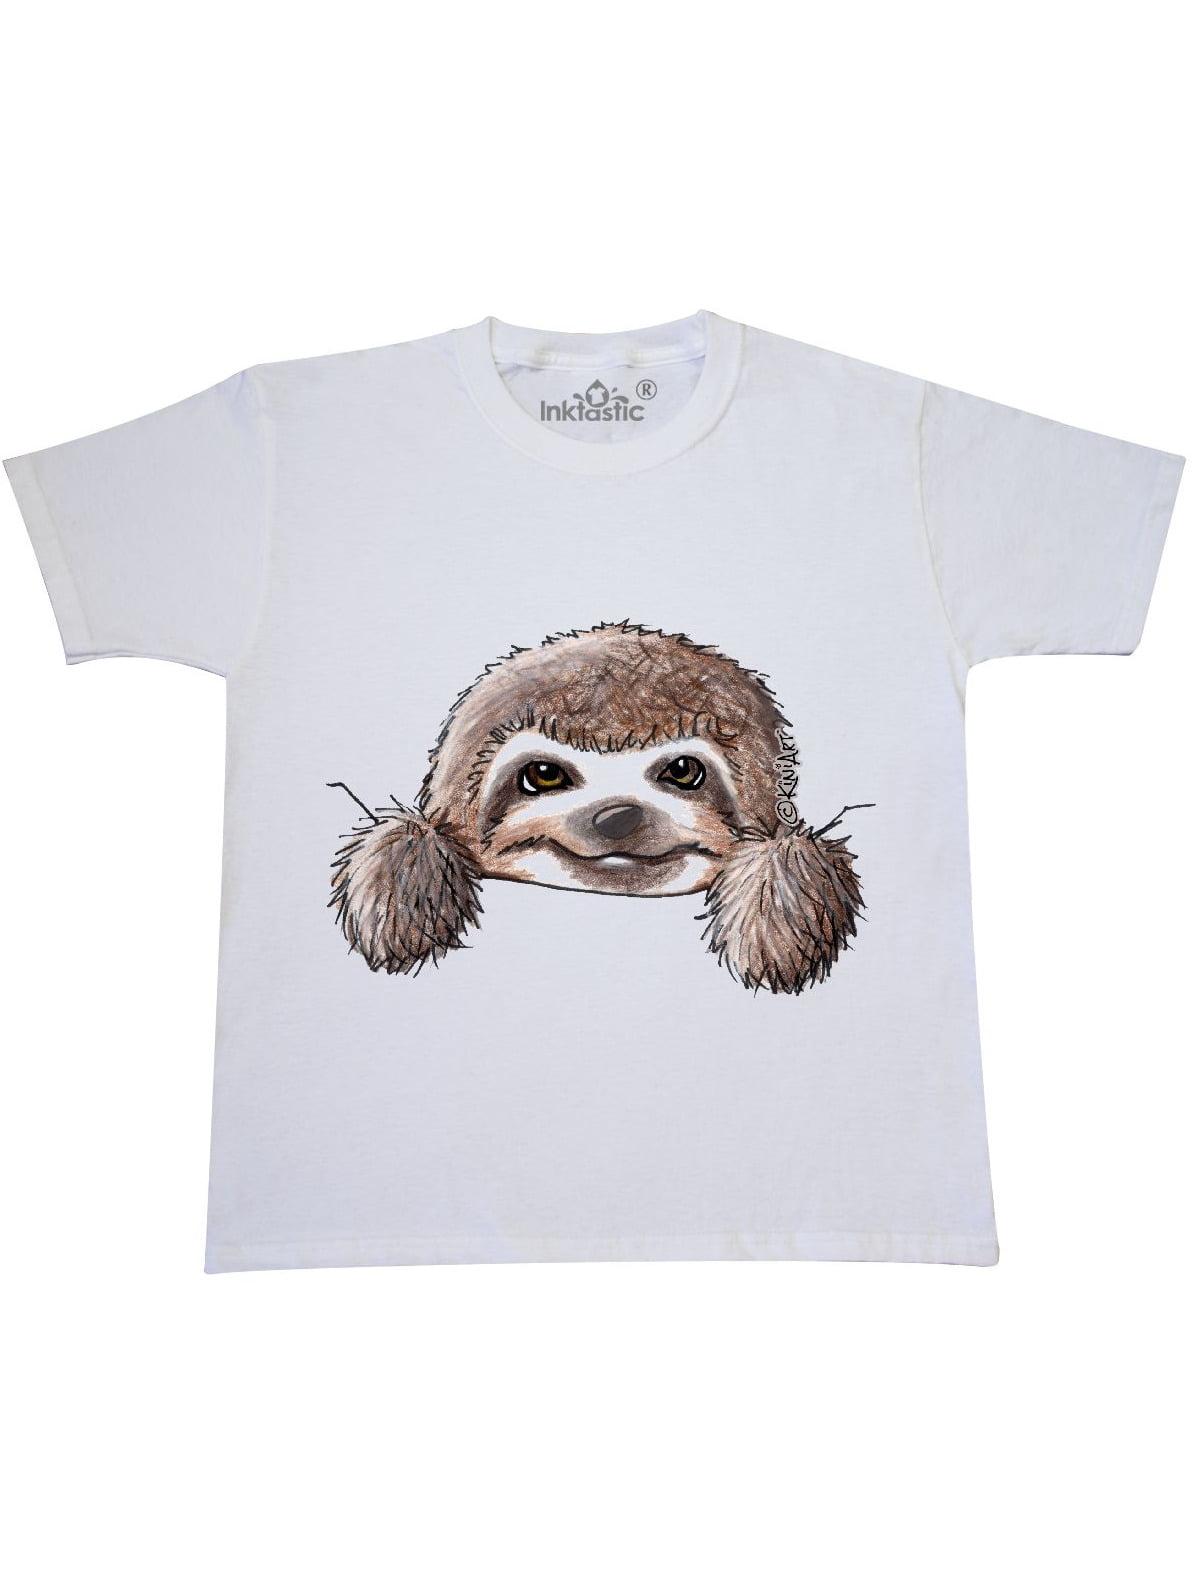 KiniArt Sloth Youth T-Shirt - KiniArt